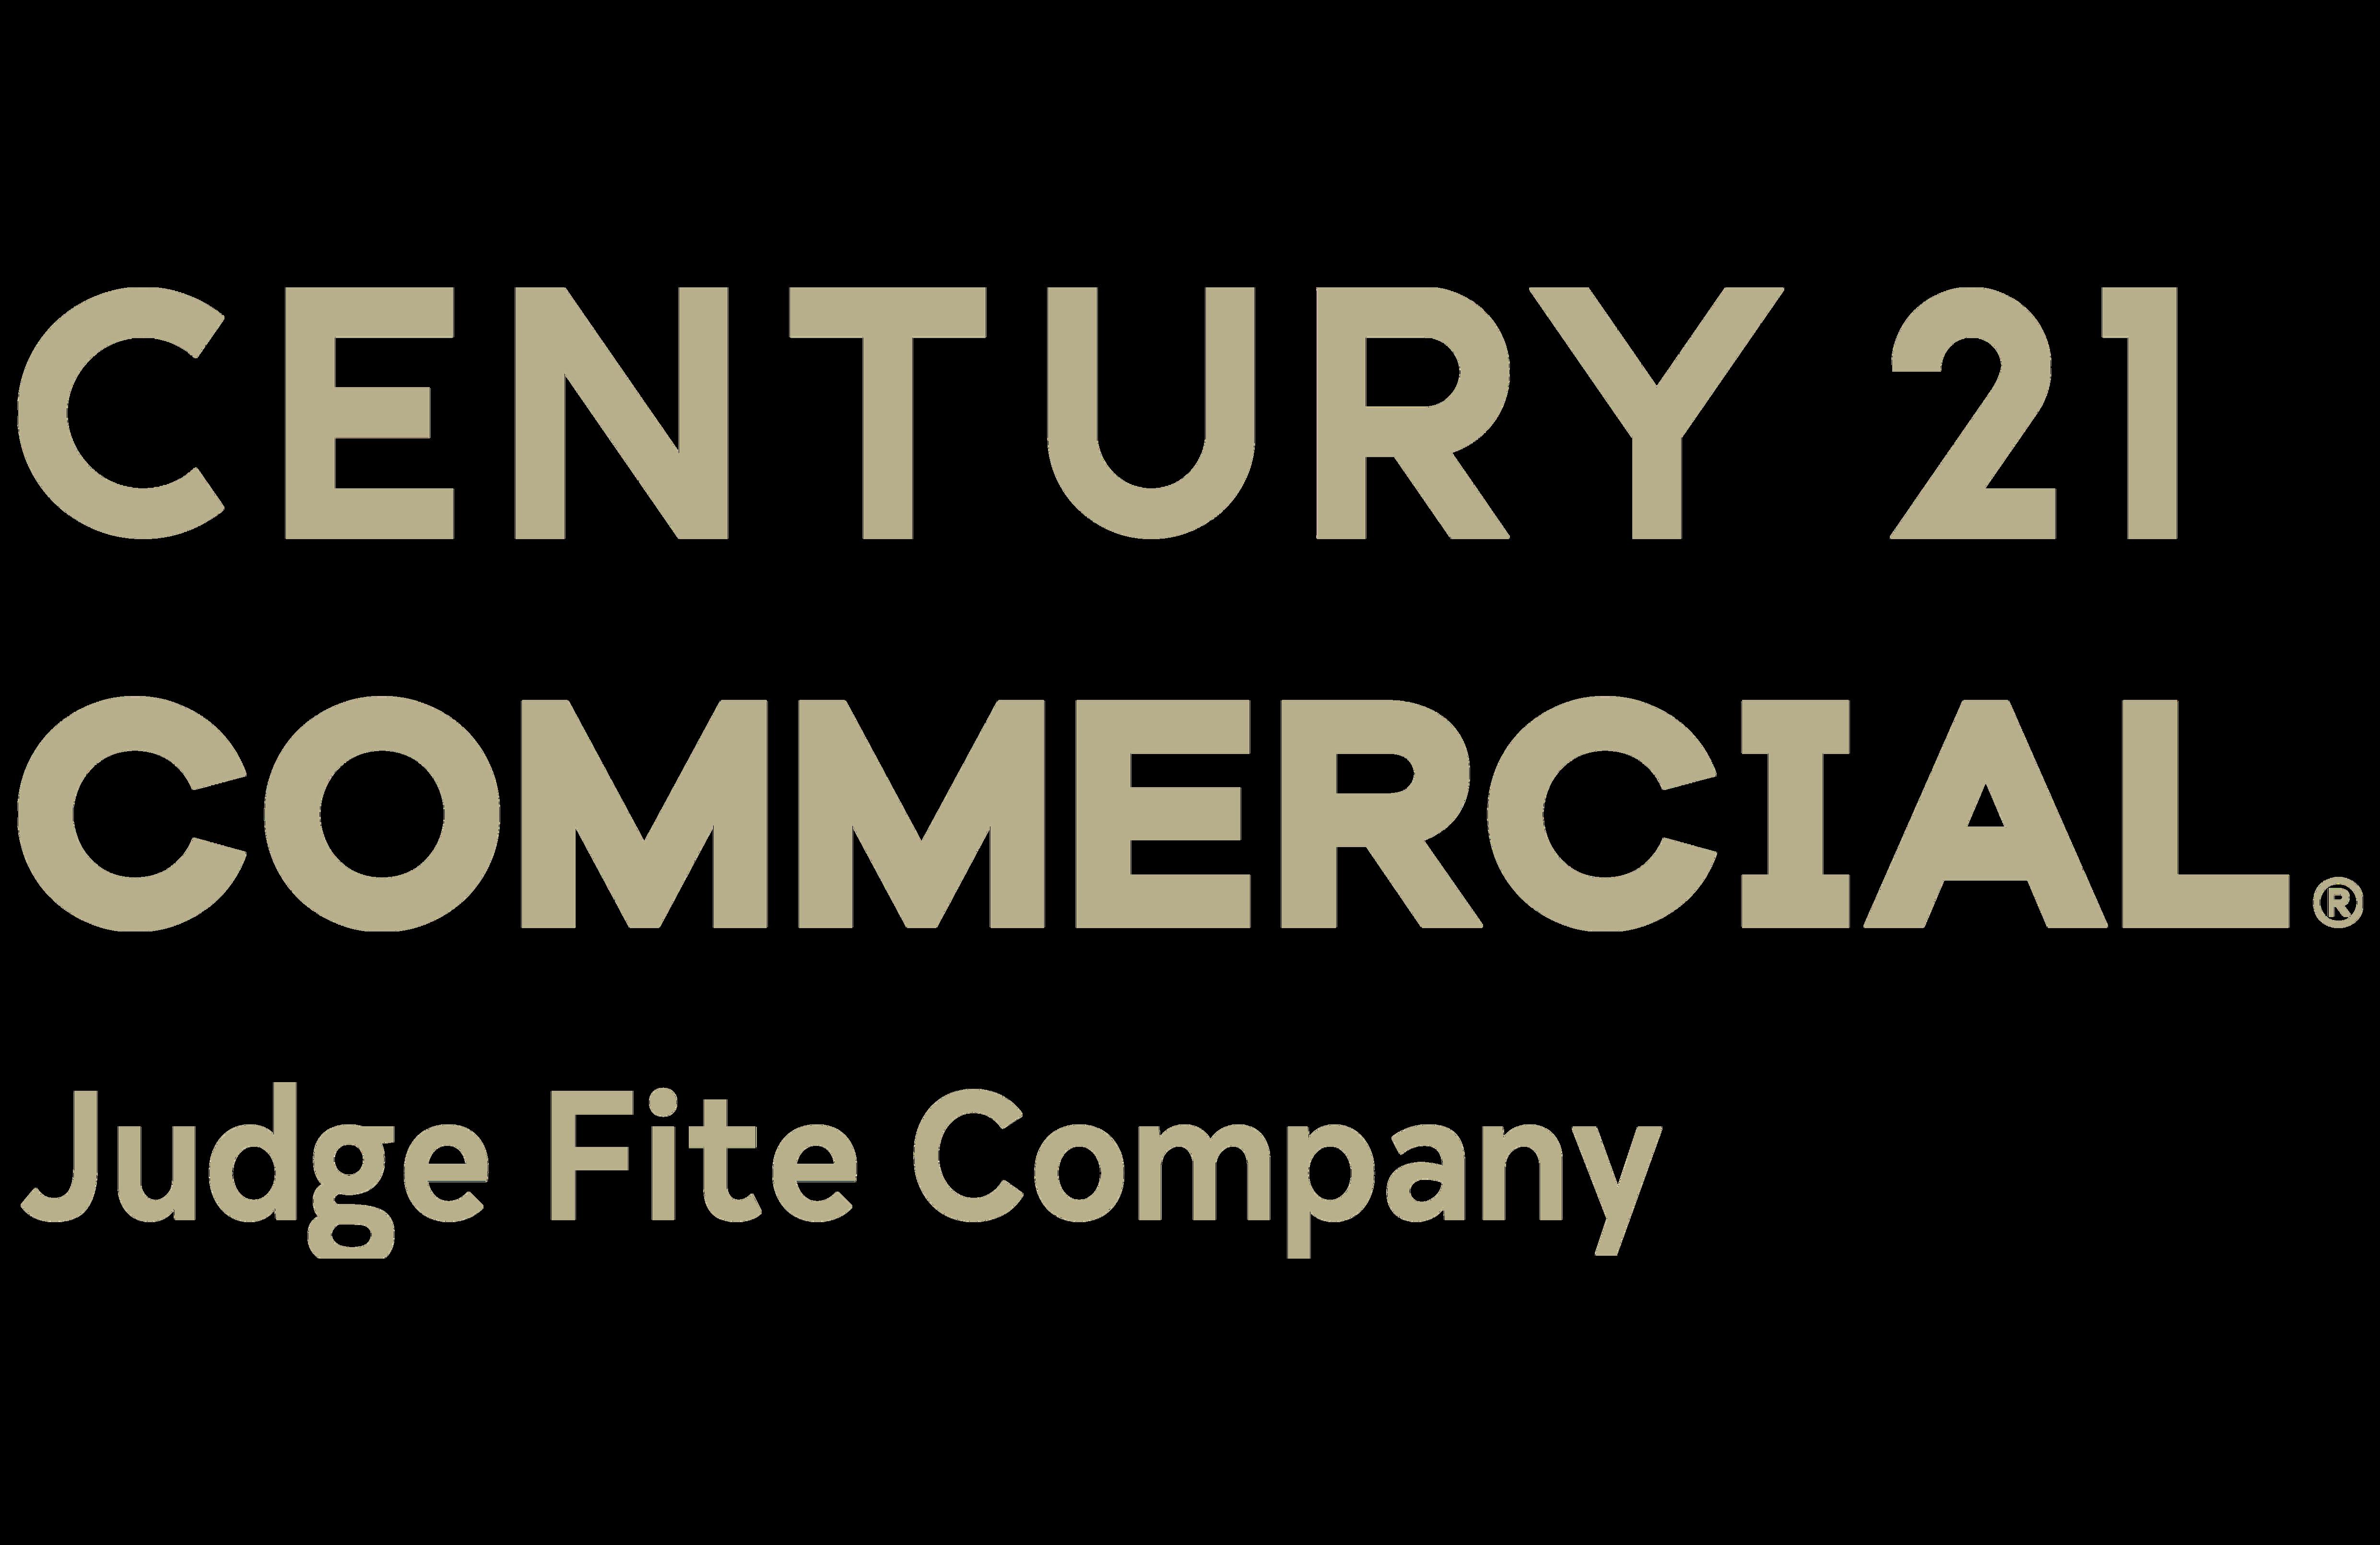 Jamie Bodiford of CENTURY 21 Judge Fite Company logo